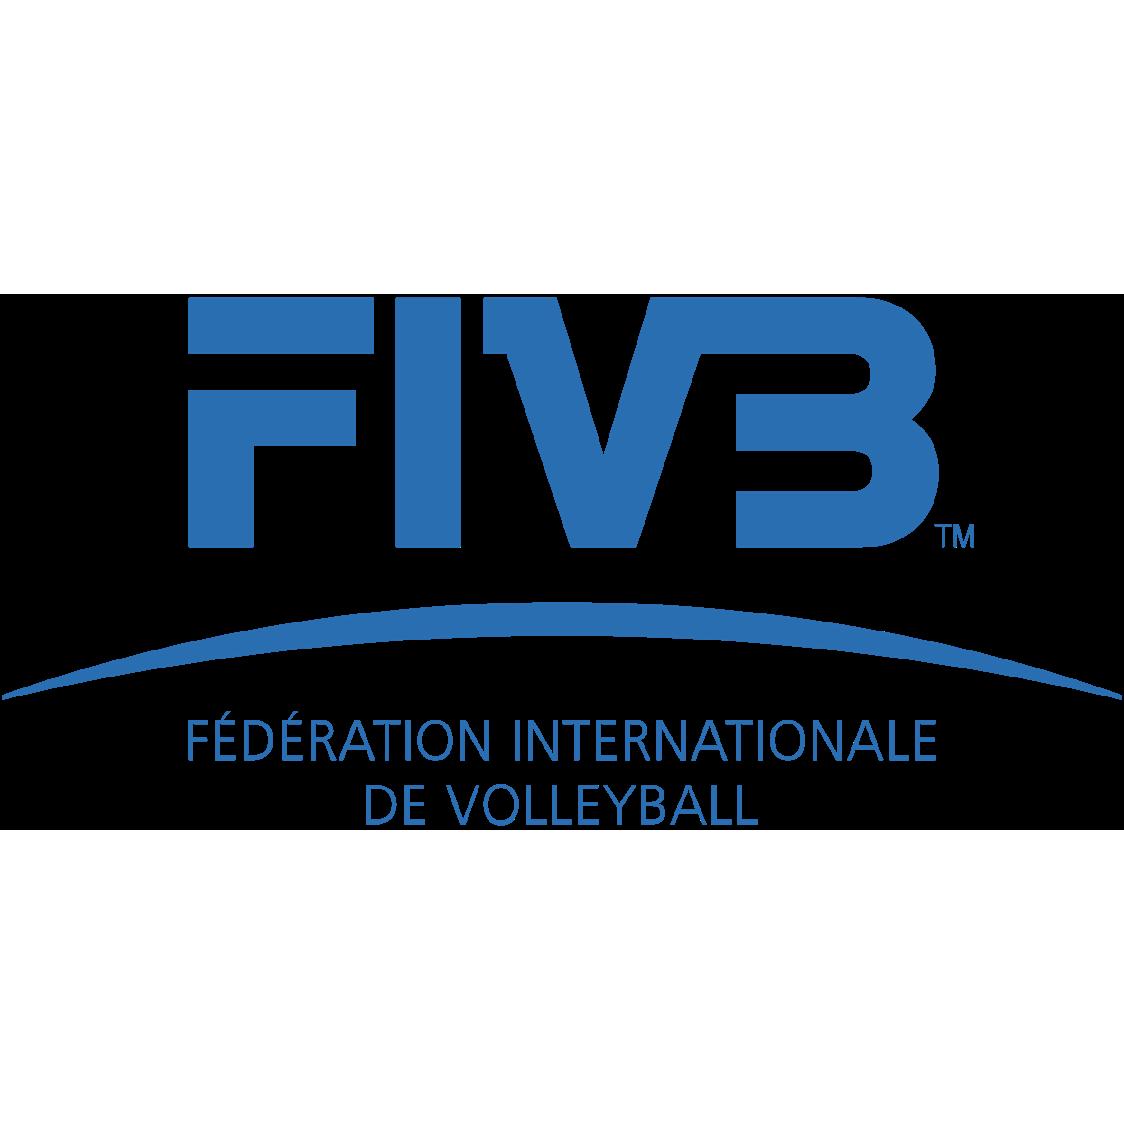 2014 U23 Beach Volleyball World Championships